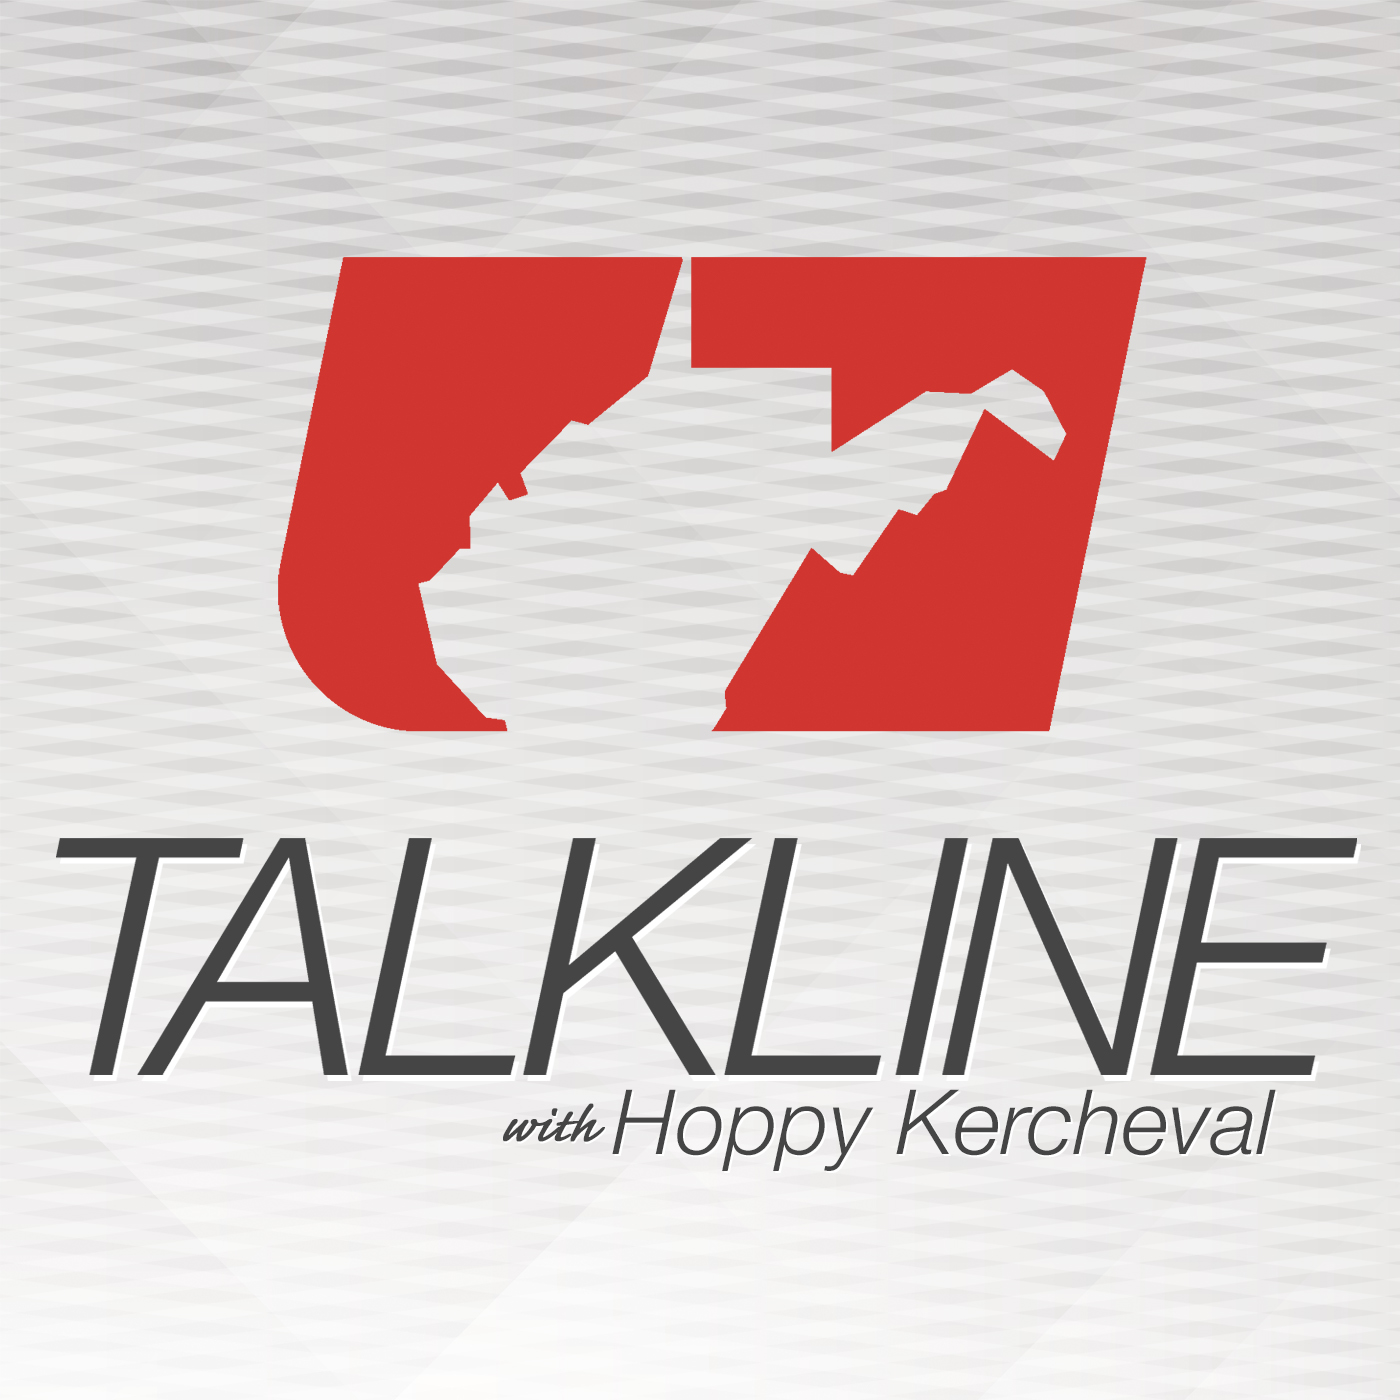 Talkline with Hoppy Kercheval